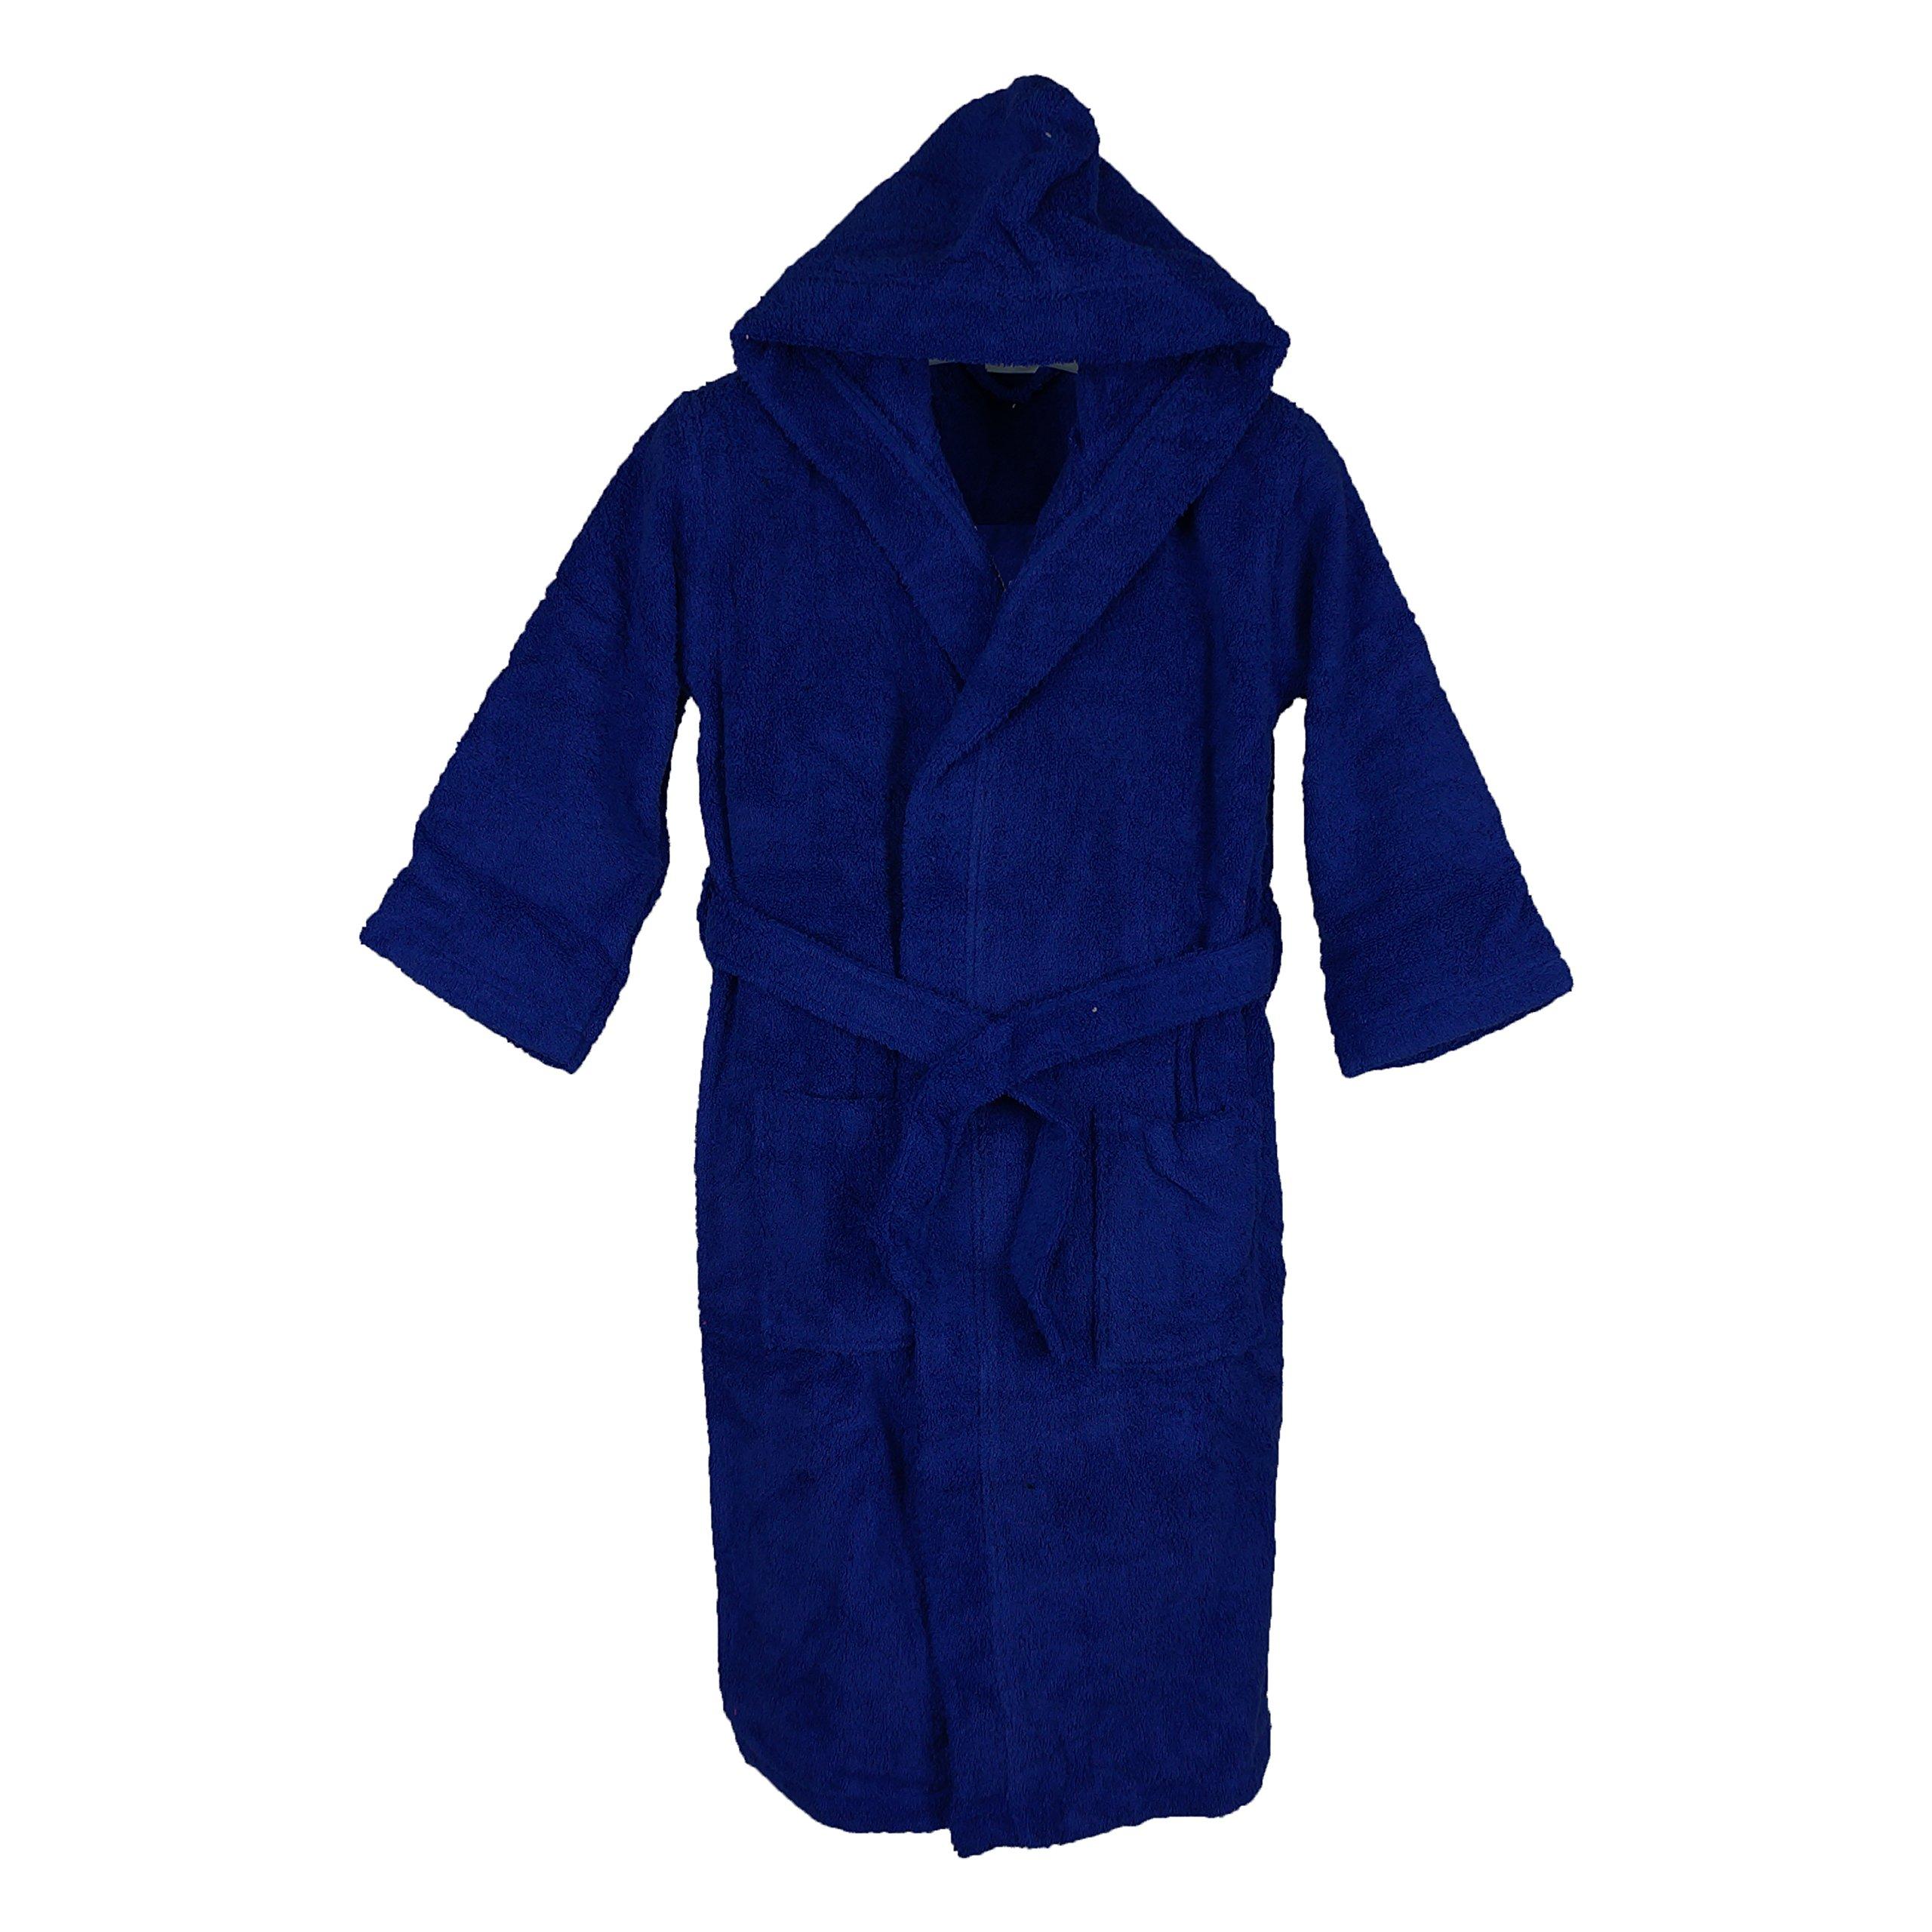 Silken Kids Teenagers Boys Hooded Robe Unisex 100% Turkish Cotton Terry Bathrobe (X-Large 44'' Length (12+ Ages), Navy)